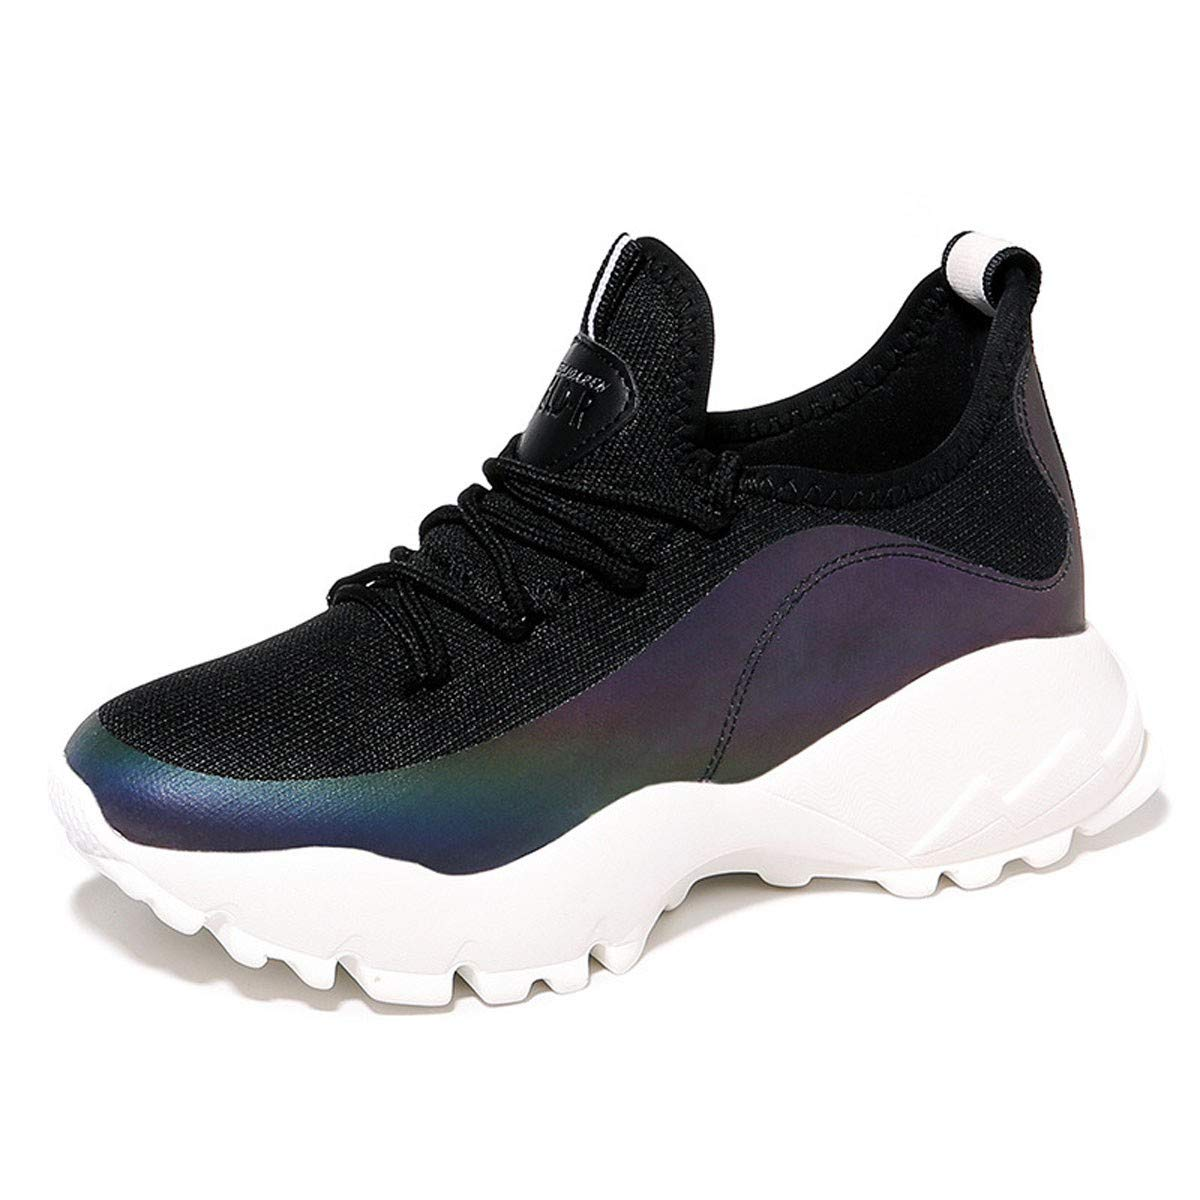 GTVERNH GTVERNH GTVERNH Frauen Schuhe Frauen - Sport - Schuhe Herbst Höher Damenschuhe Koreanischen Version Mode Freizeit 23820a